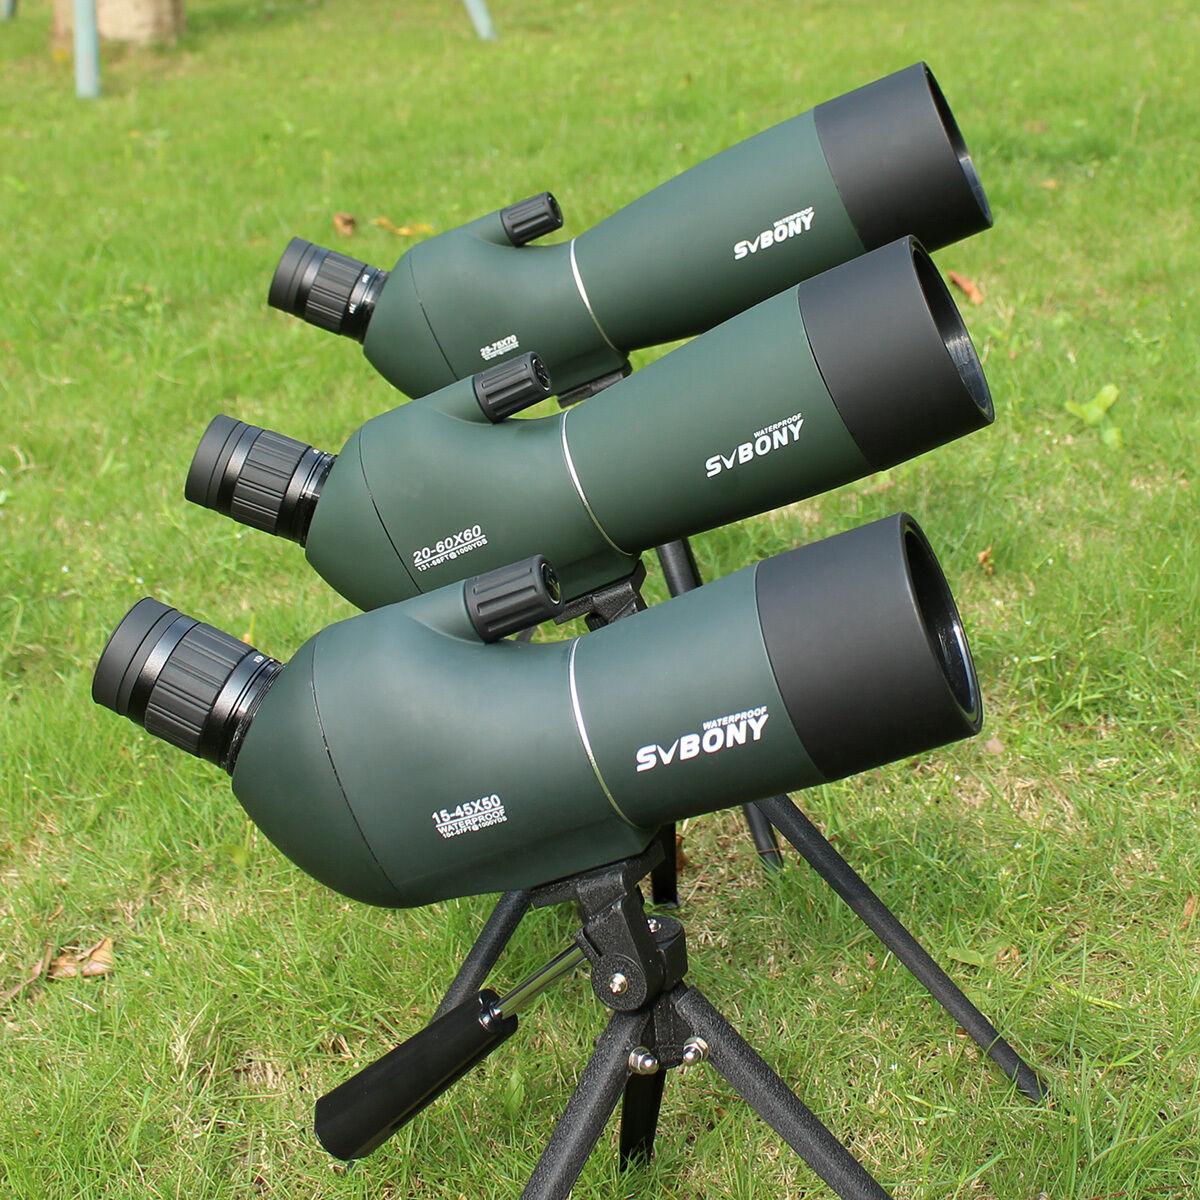 Svbony SV28 15-45x50mm 20-60x60mm 25-75x70mm telescopio terrestre zoom en ángulo y pista en